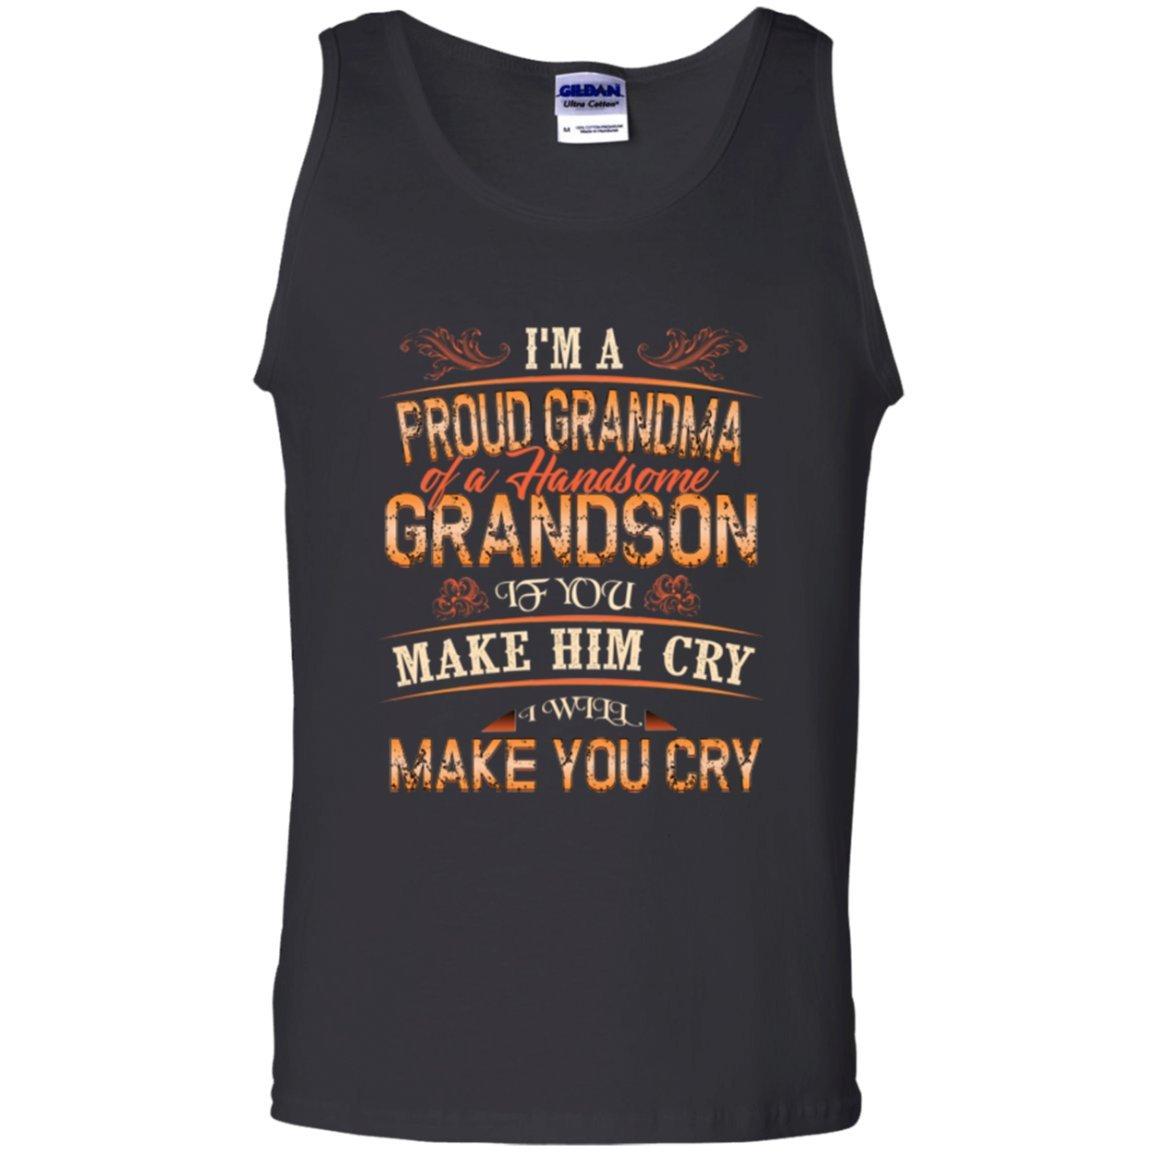 Vinteena Im a Proud Grandma Of a Handsome Grandson Unisex Tanktop Tshirt